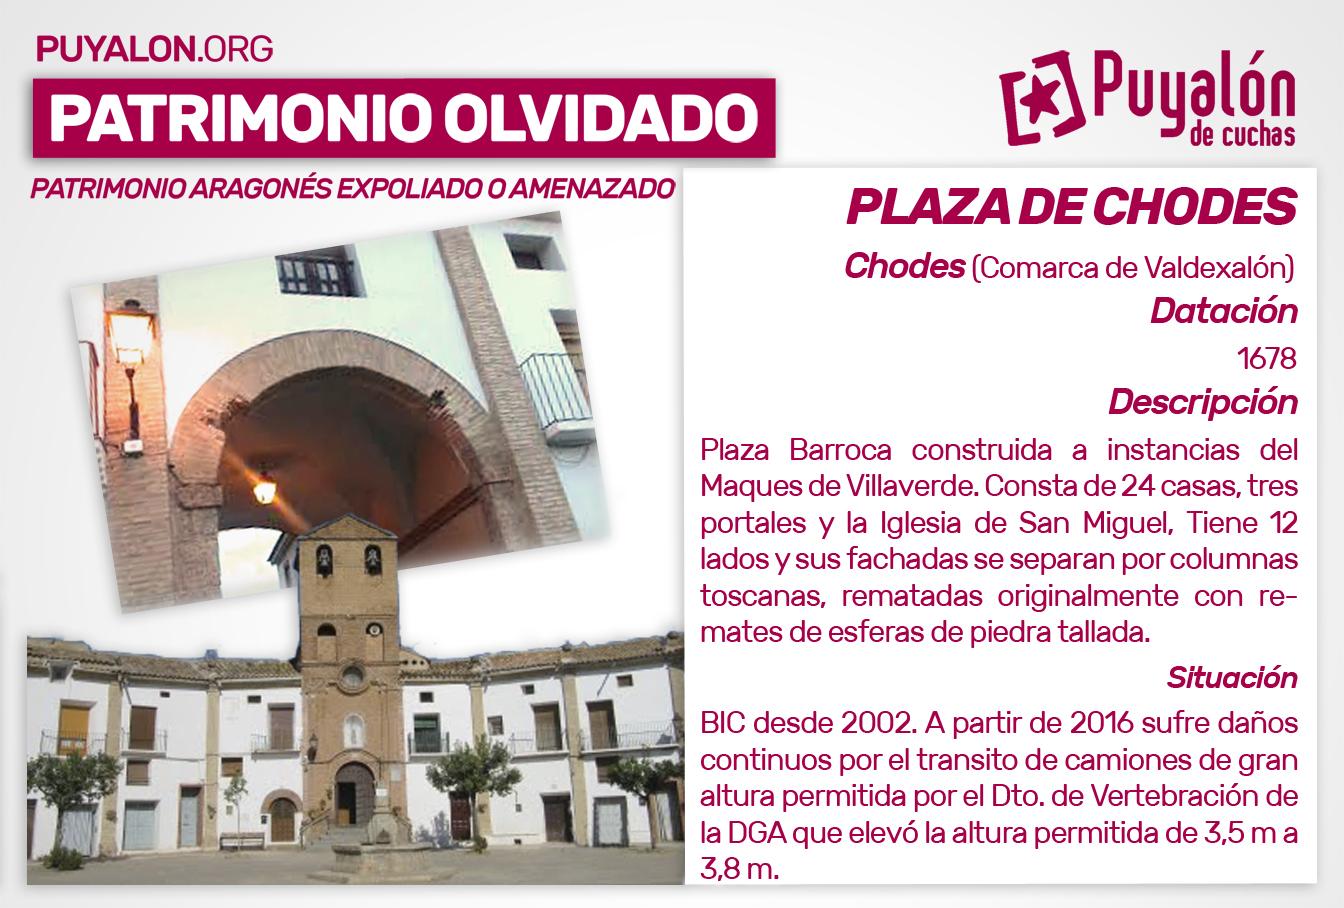 Plaza de Chodes